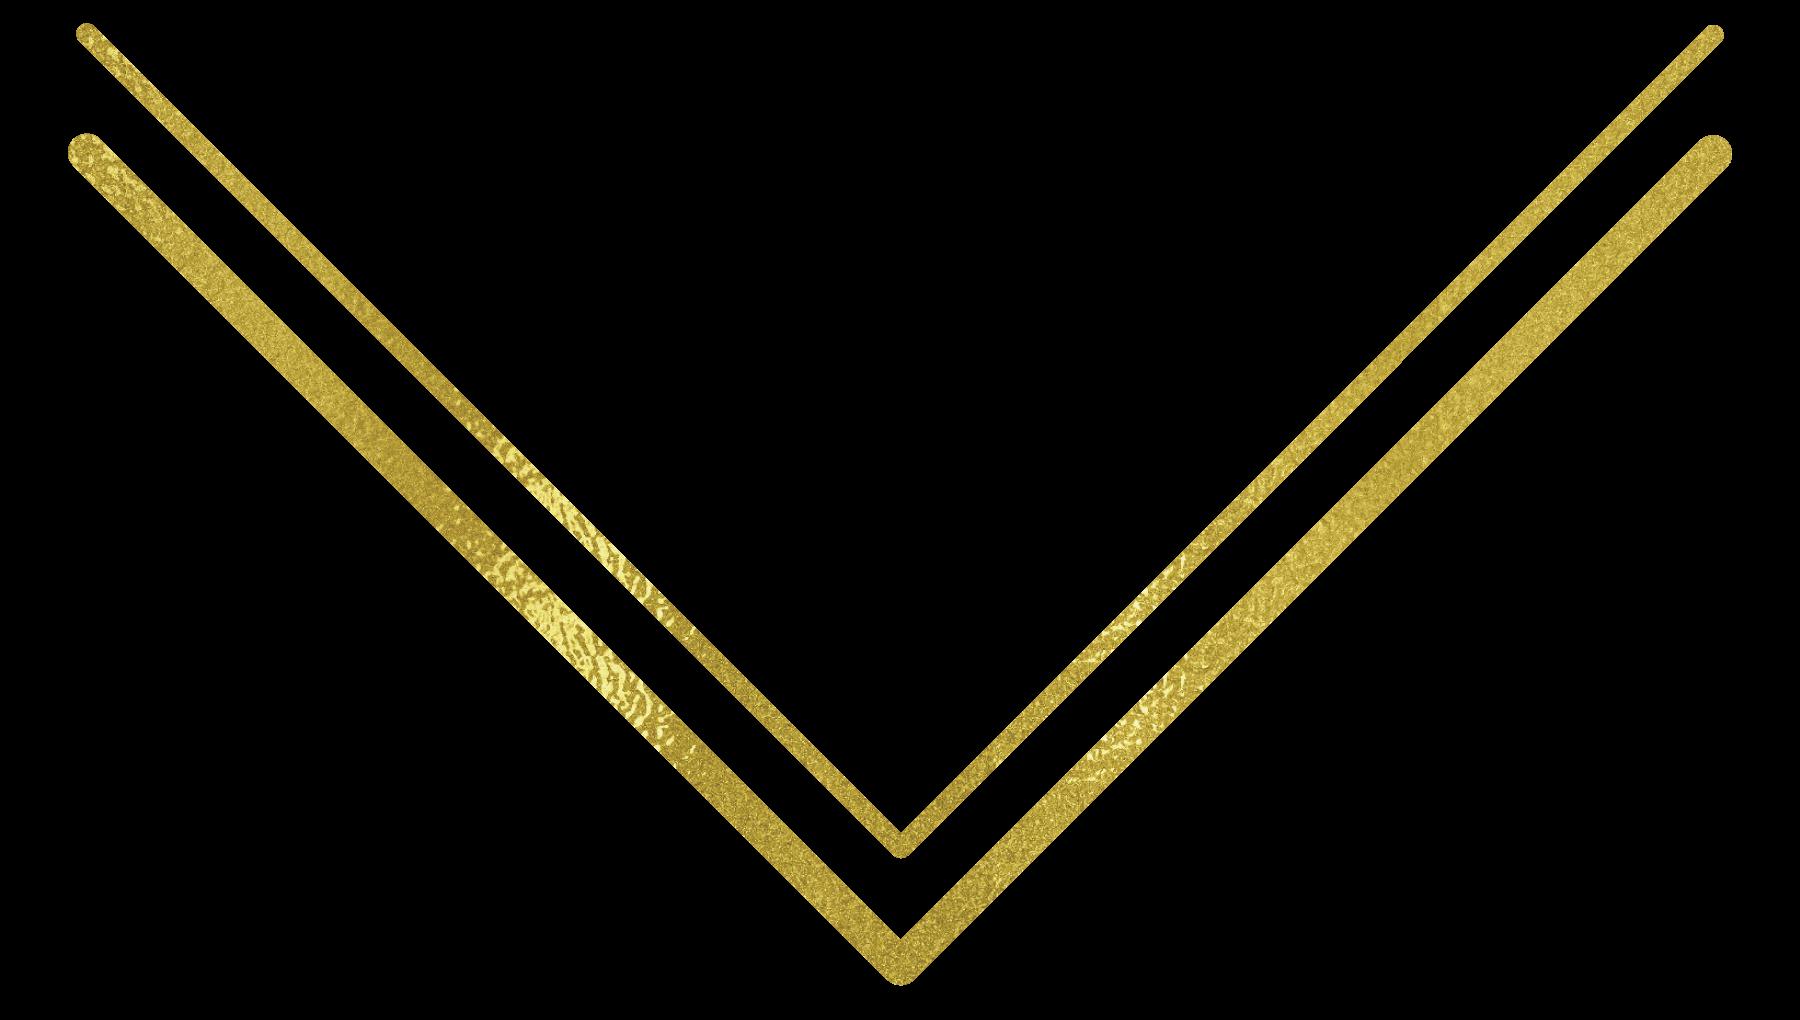 Maharani Brand Gold Arrows